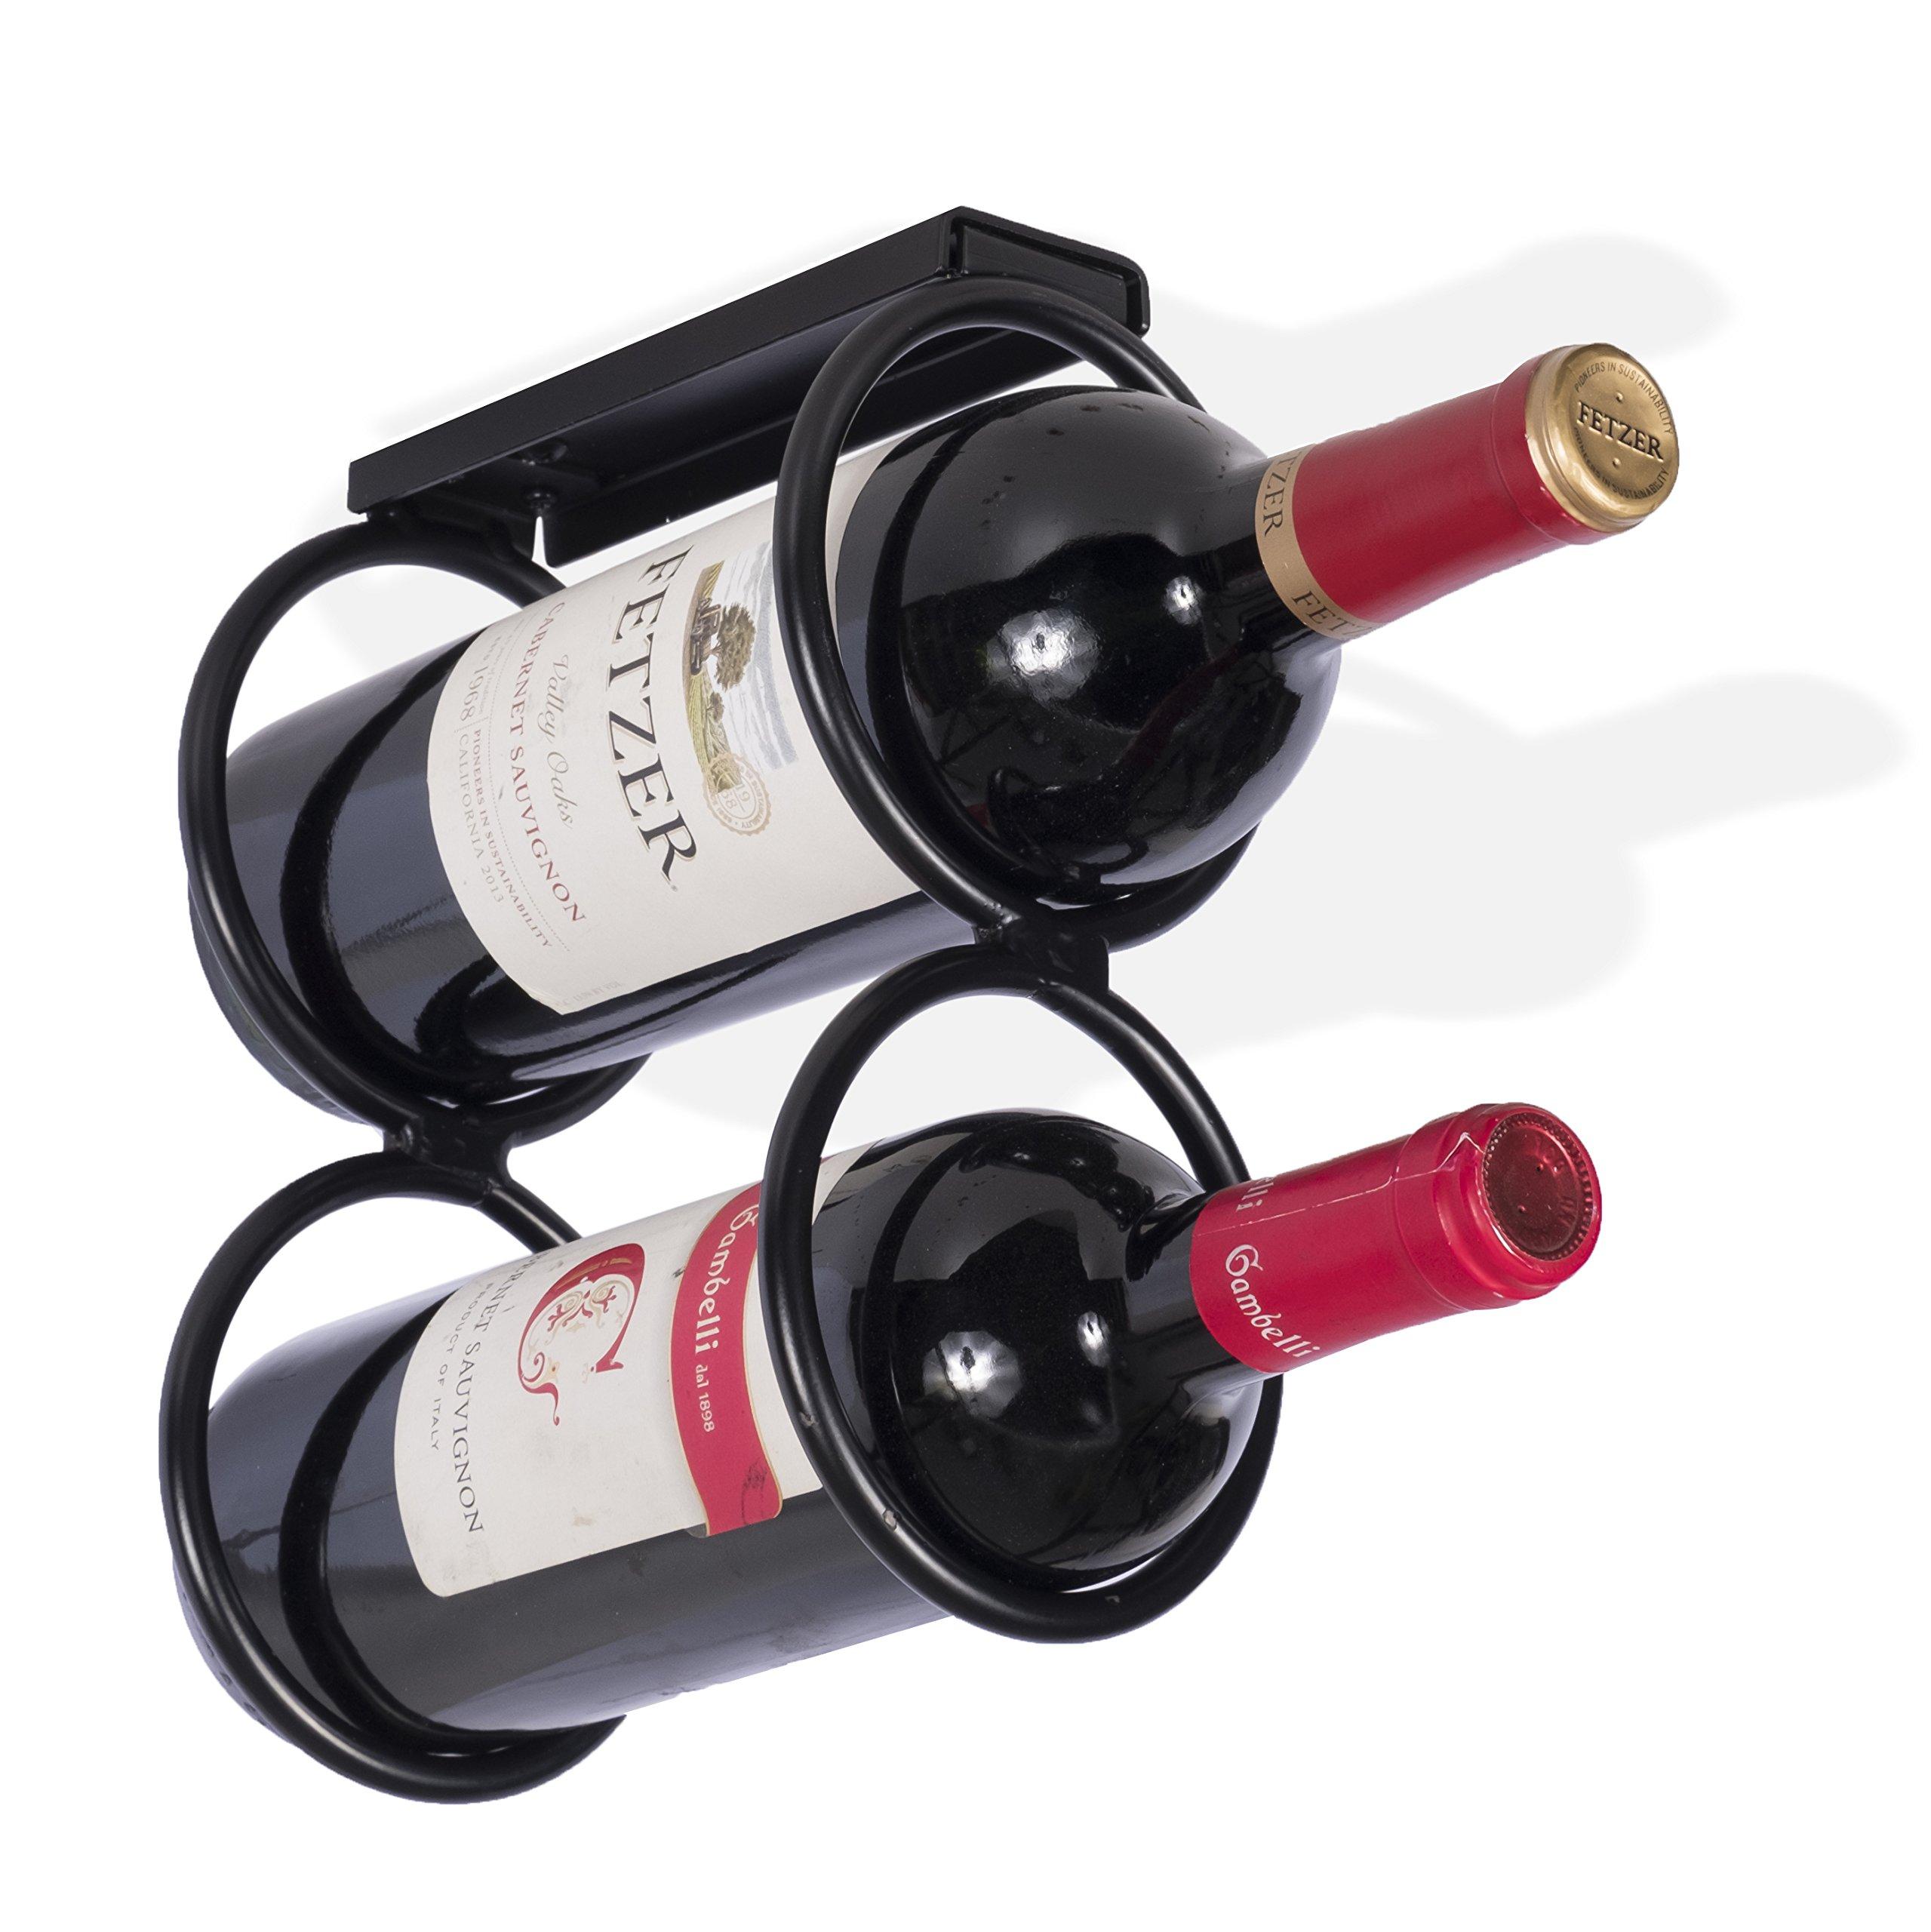 Wallniture Under Cabinet Durable Iron Vertical Wine Storage Rack for Liquor Bottles Black (1)